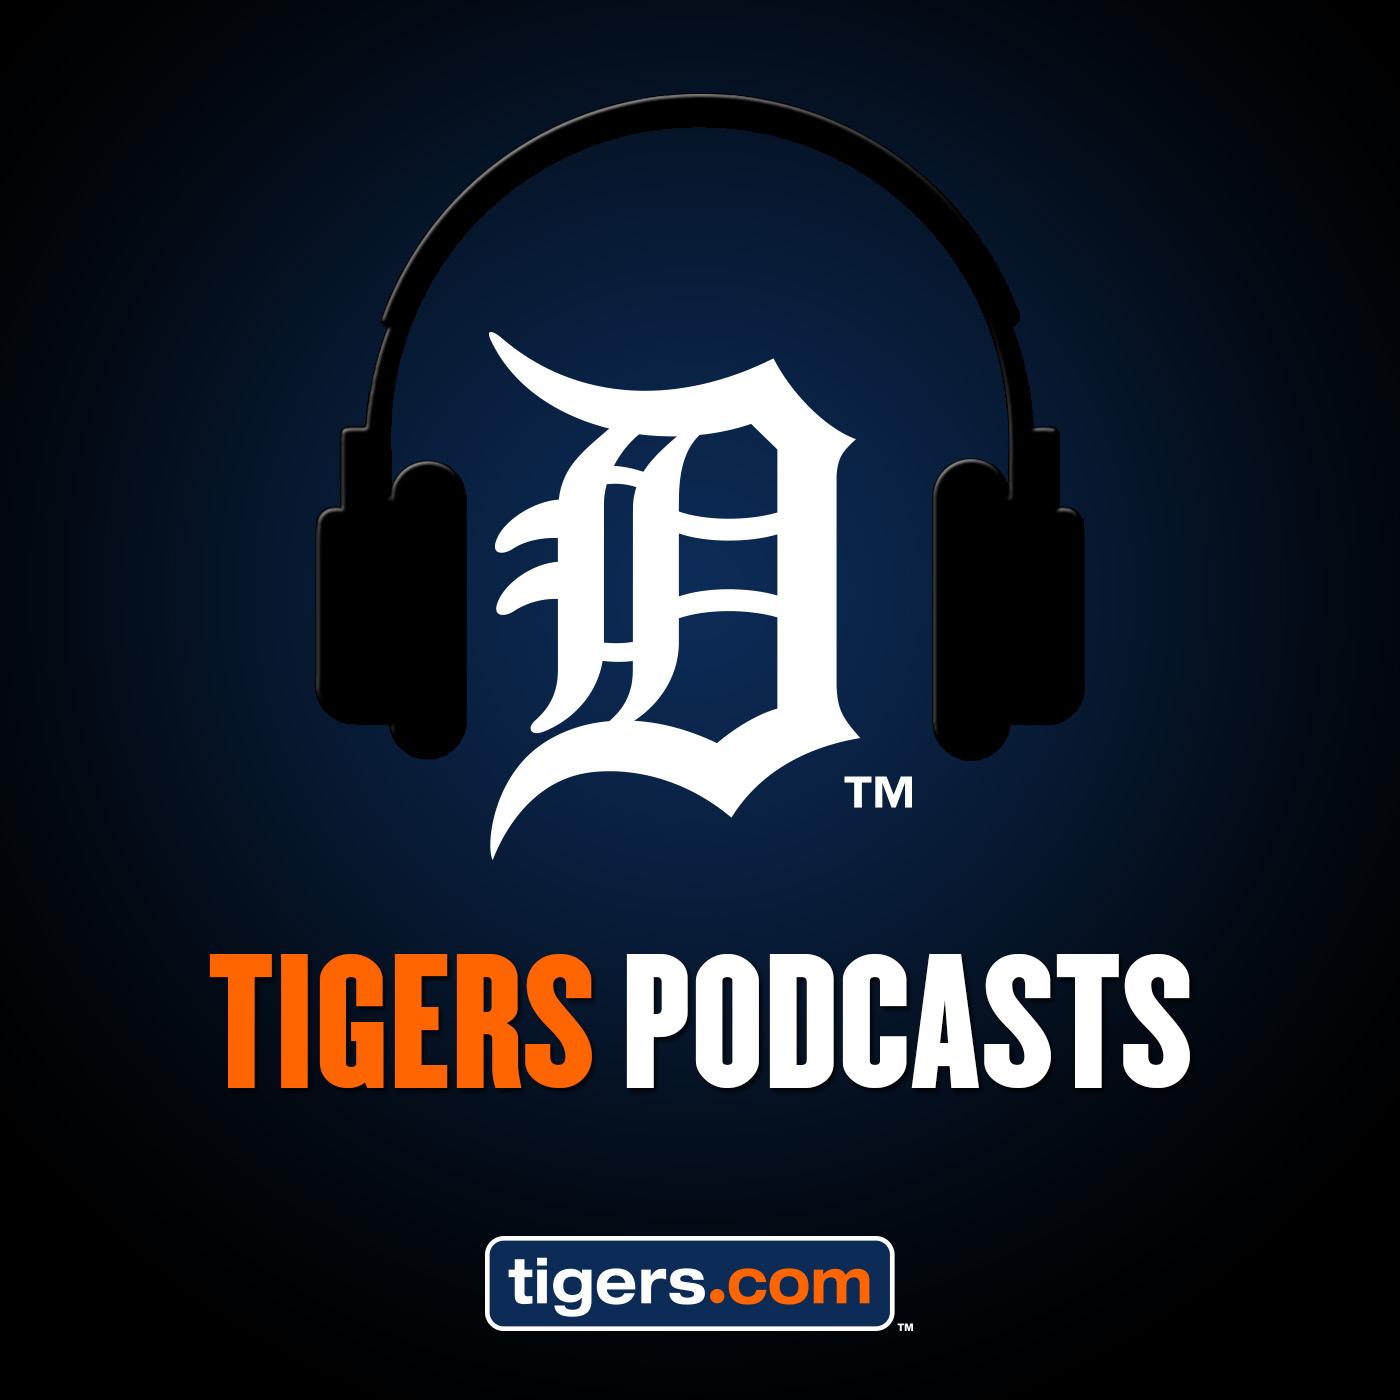 <![CDATA[Detroit Tigers Podcast]]>